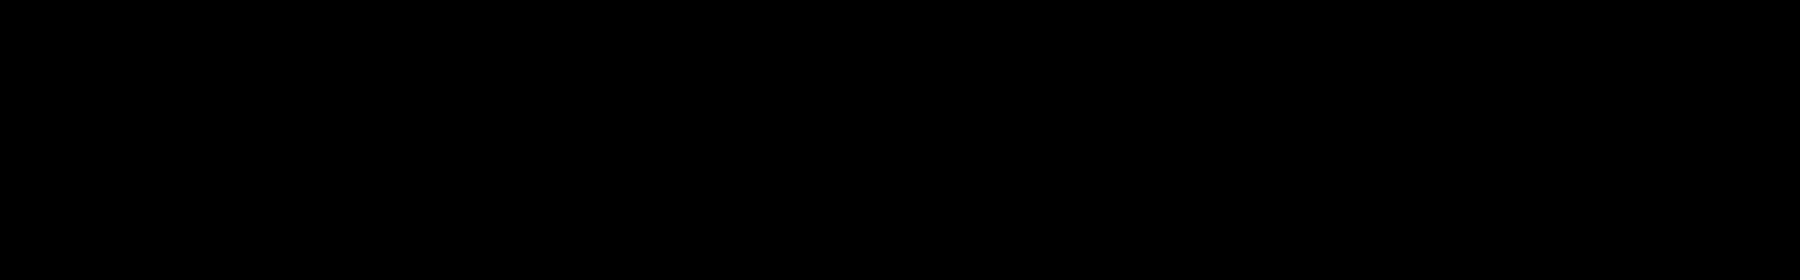 Organic DnB audio waveform